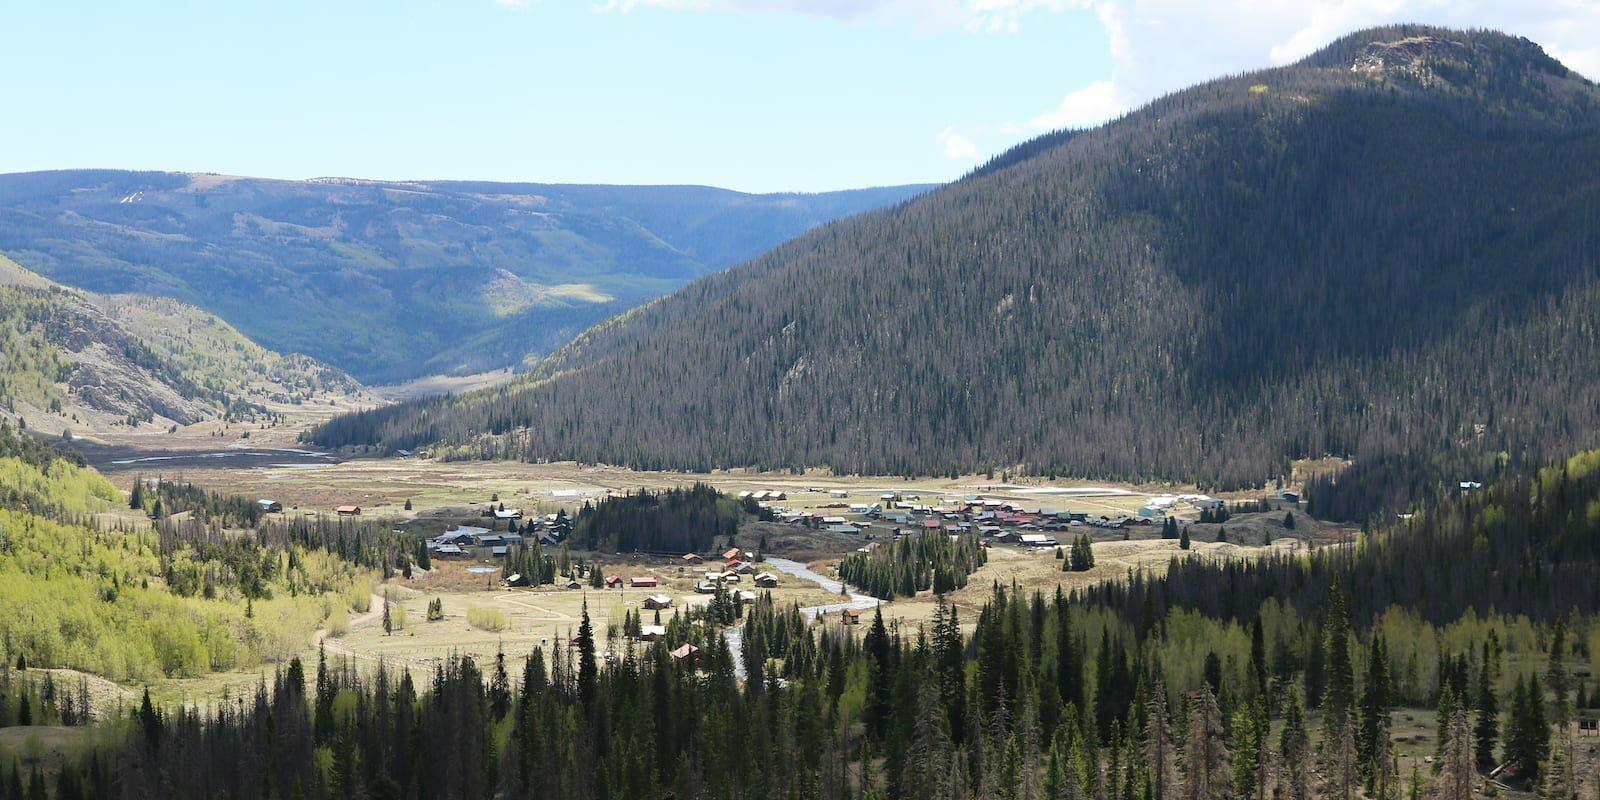 Platoro Colorado Overlook from Forest Road 250